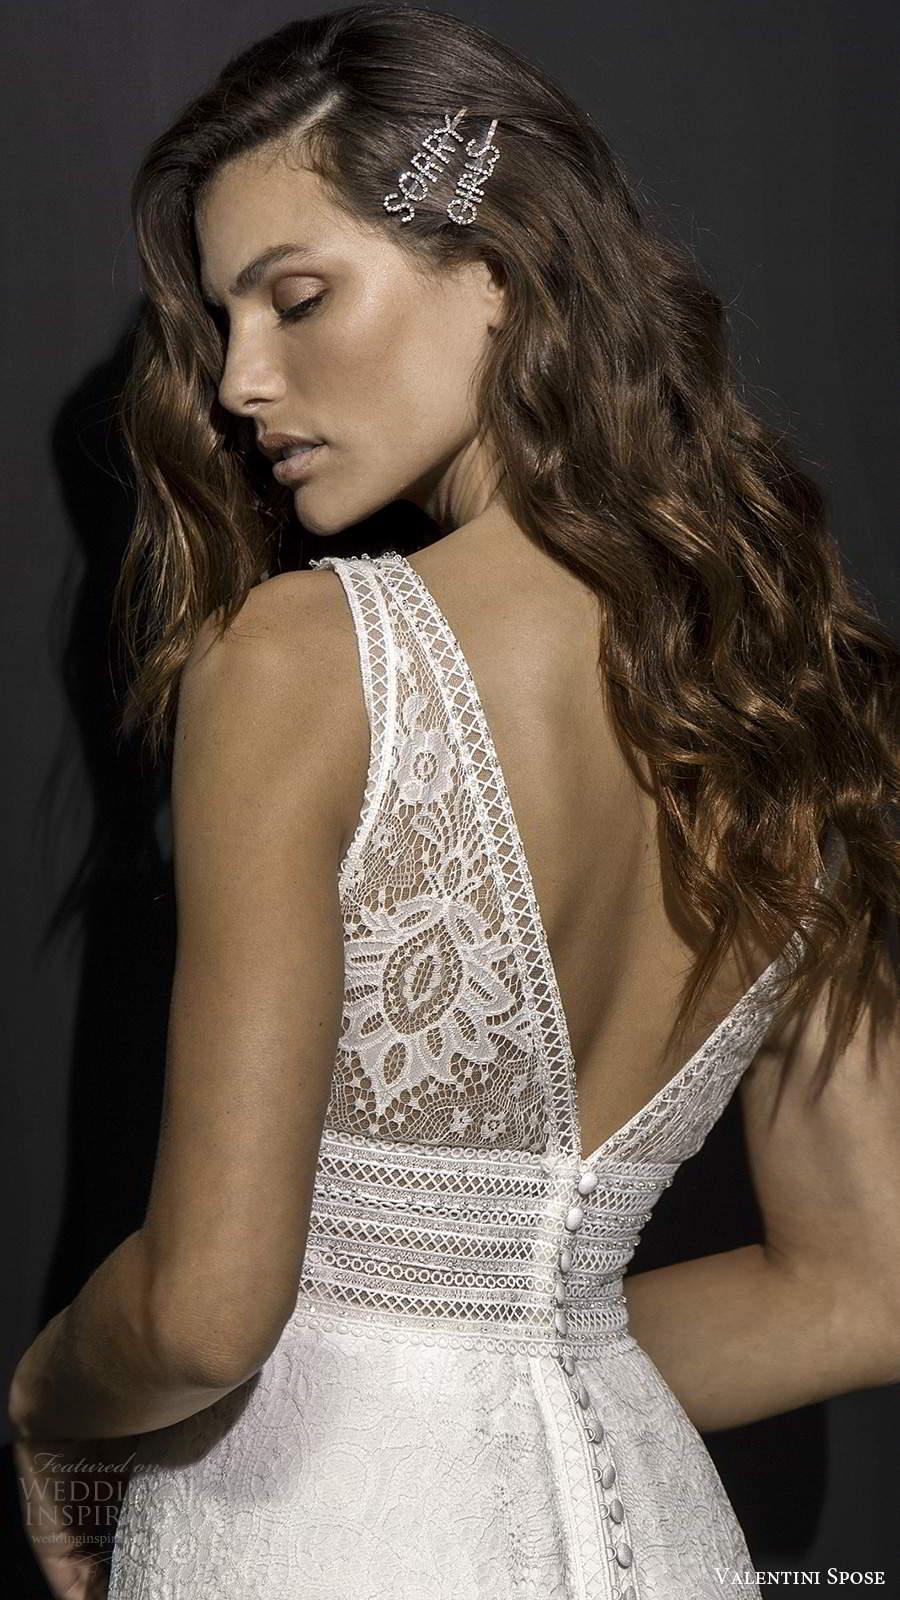 valentini spose fall 2020 bridal sleeveless plunging v neckline fully embellished lace column soft a line lace wedding dress slit skirt v back chapel train (8) zbv